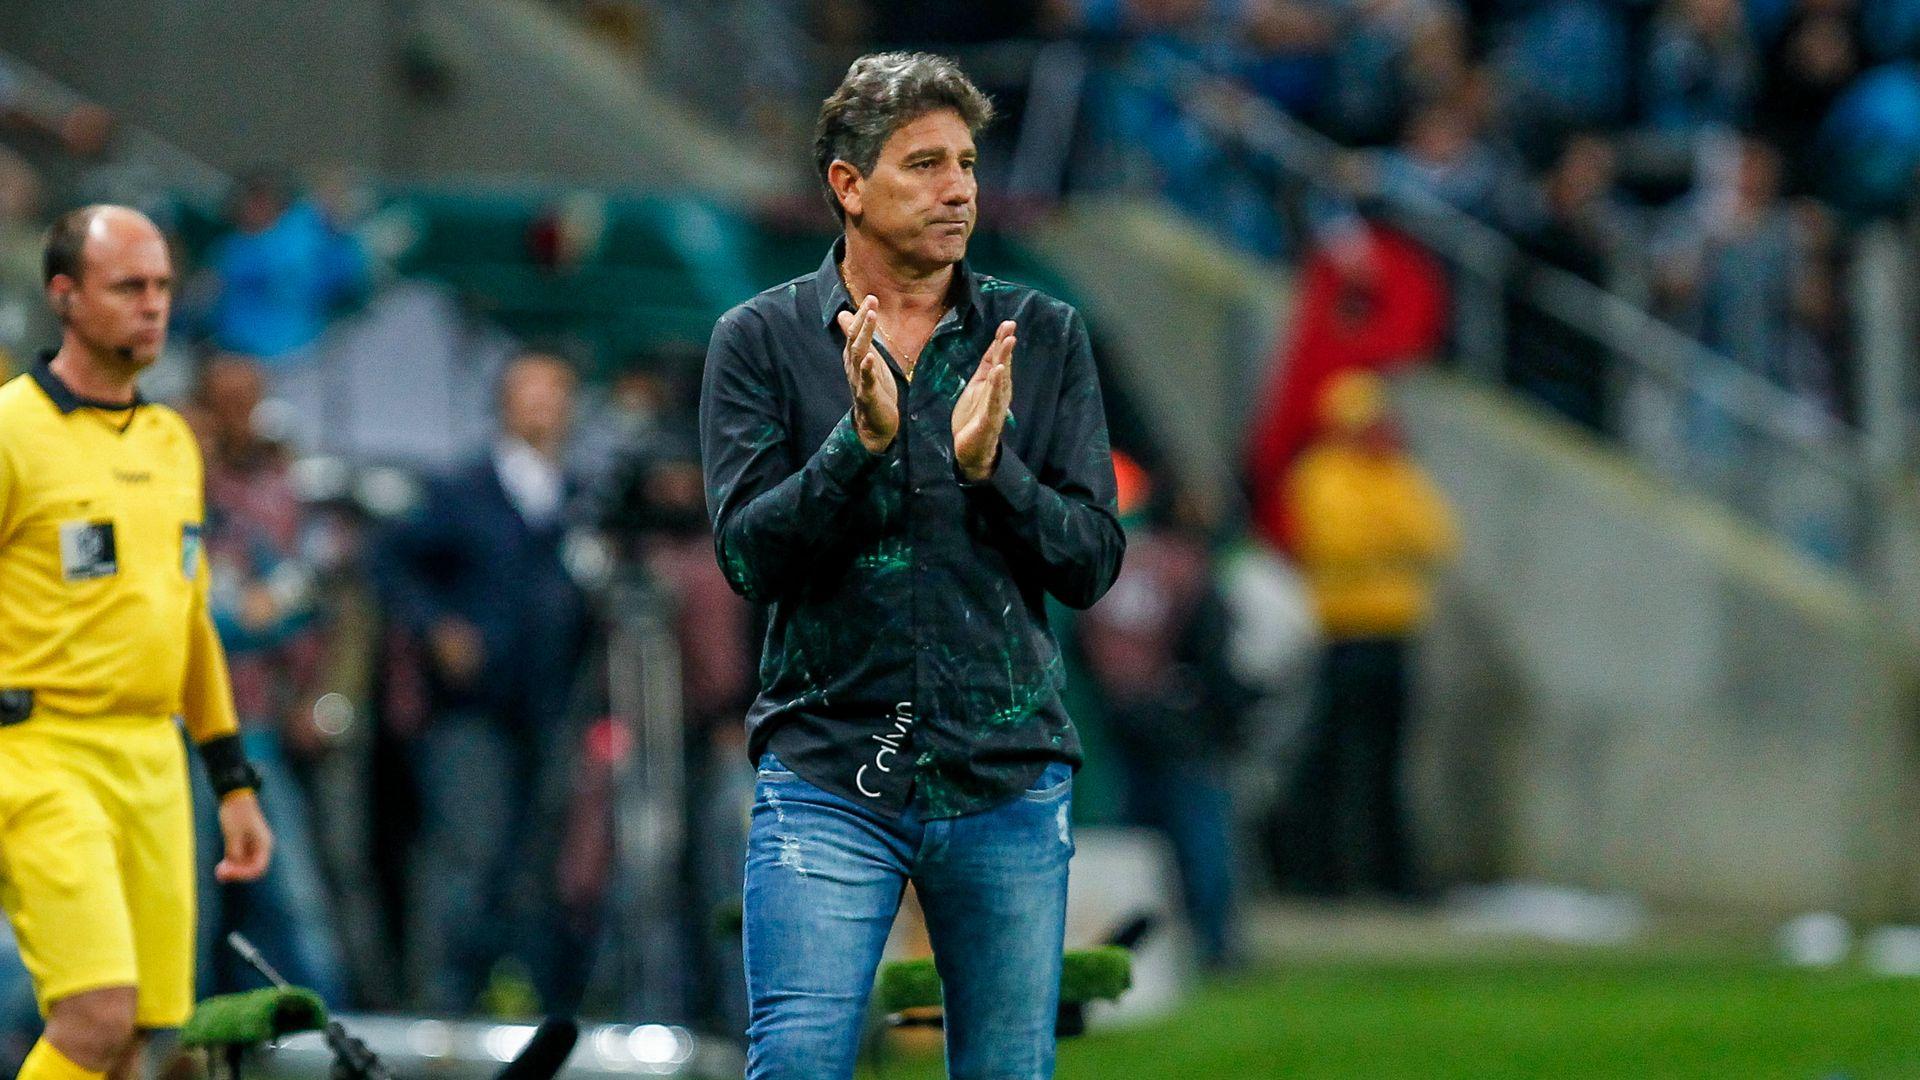 Renato Gaucho Gremio Cruzeiro Copa do Brasil 16082017